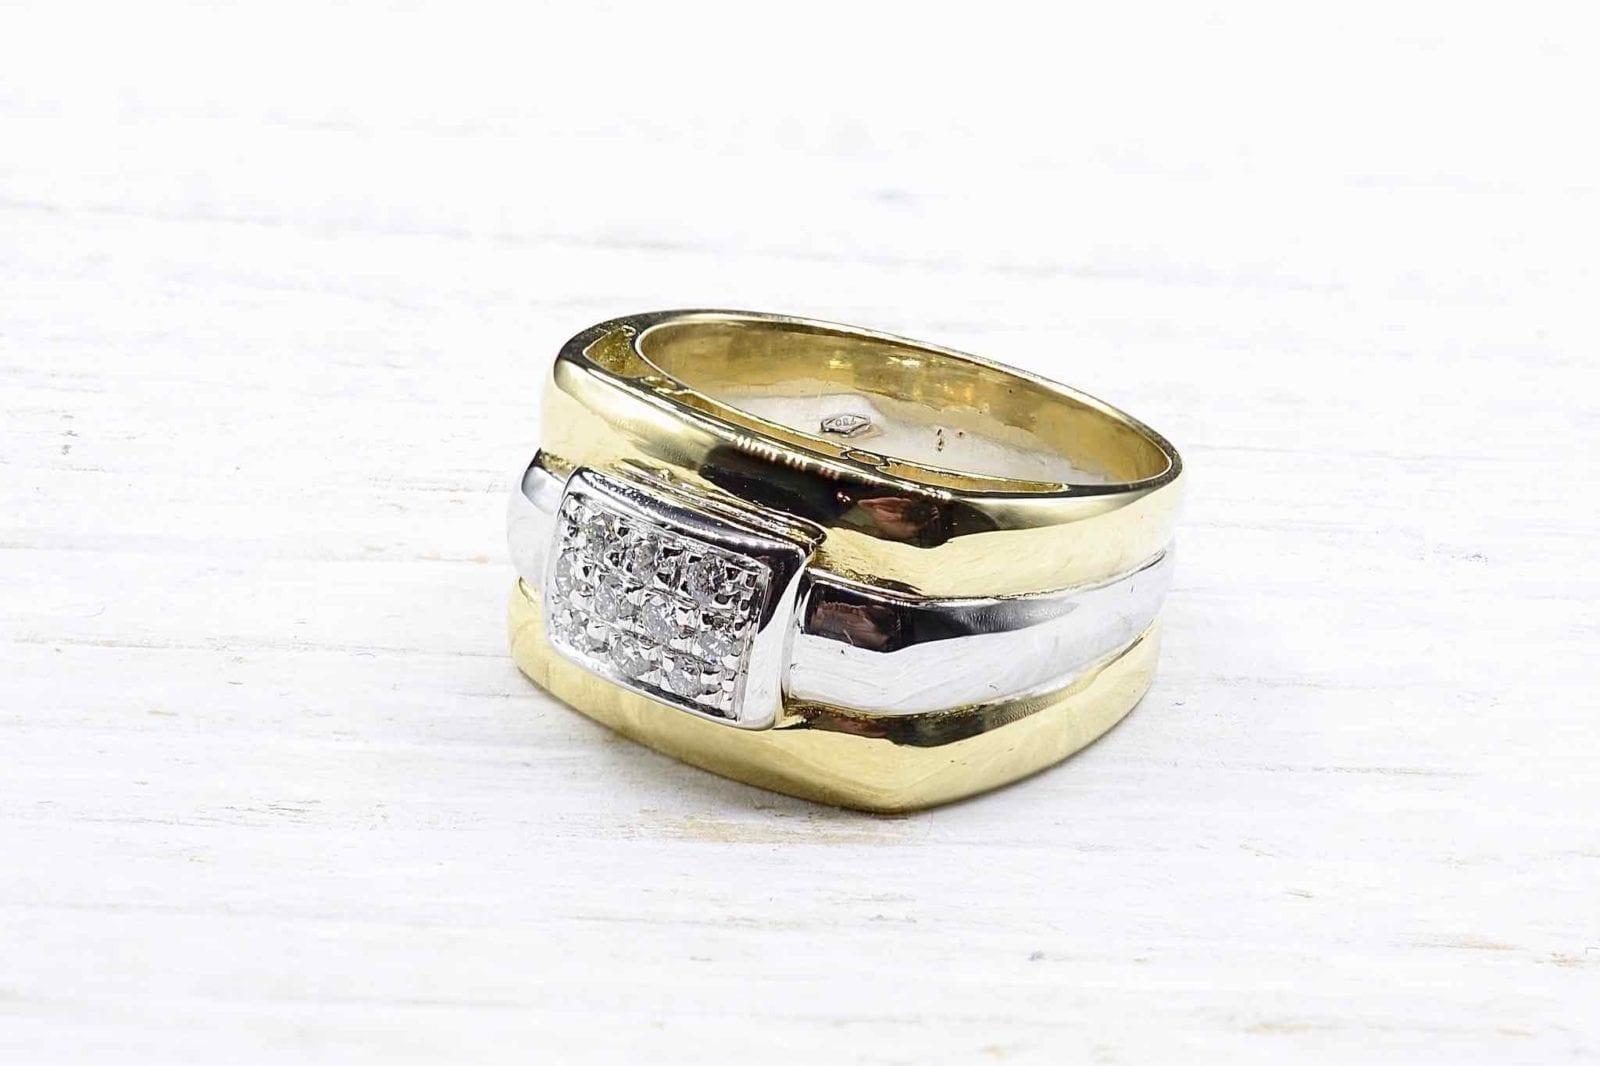 Bague diamants or jaune et or blanc 18k